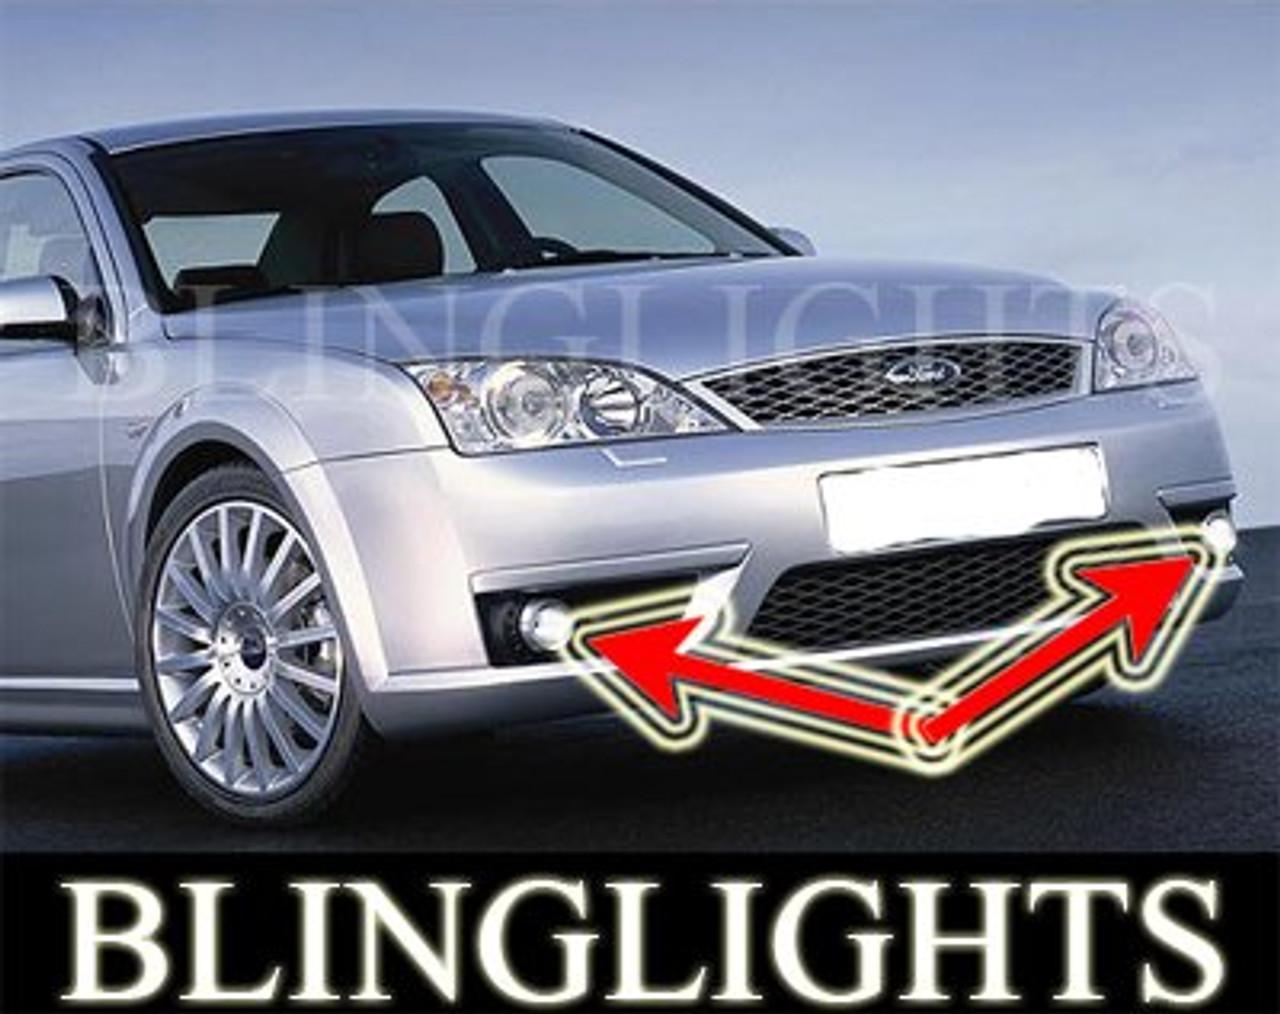 2001 2002 2003 2004 2005 2006 2007 Ford Mondeo Mk3 Xenon Fog Lamps Driving Lights Foglamps Kit